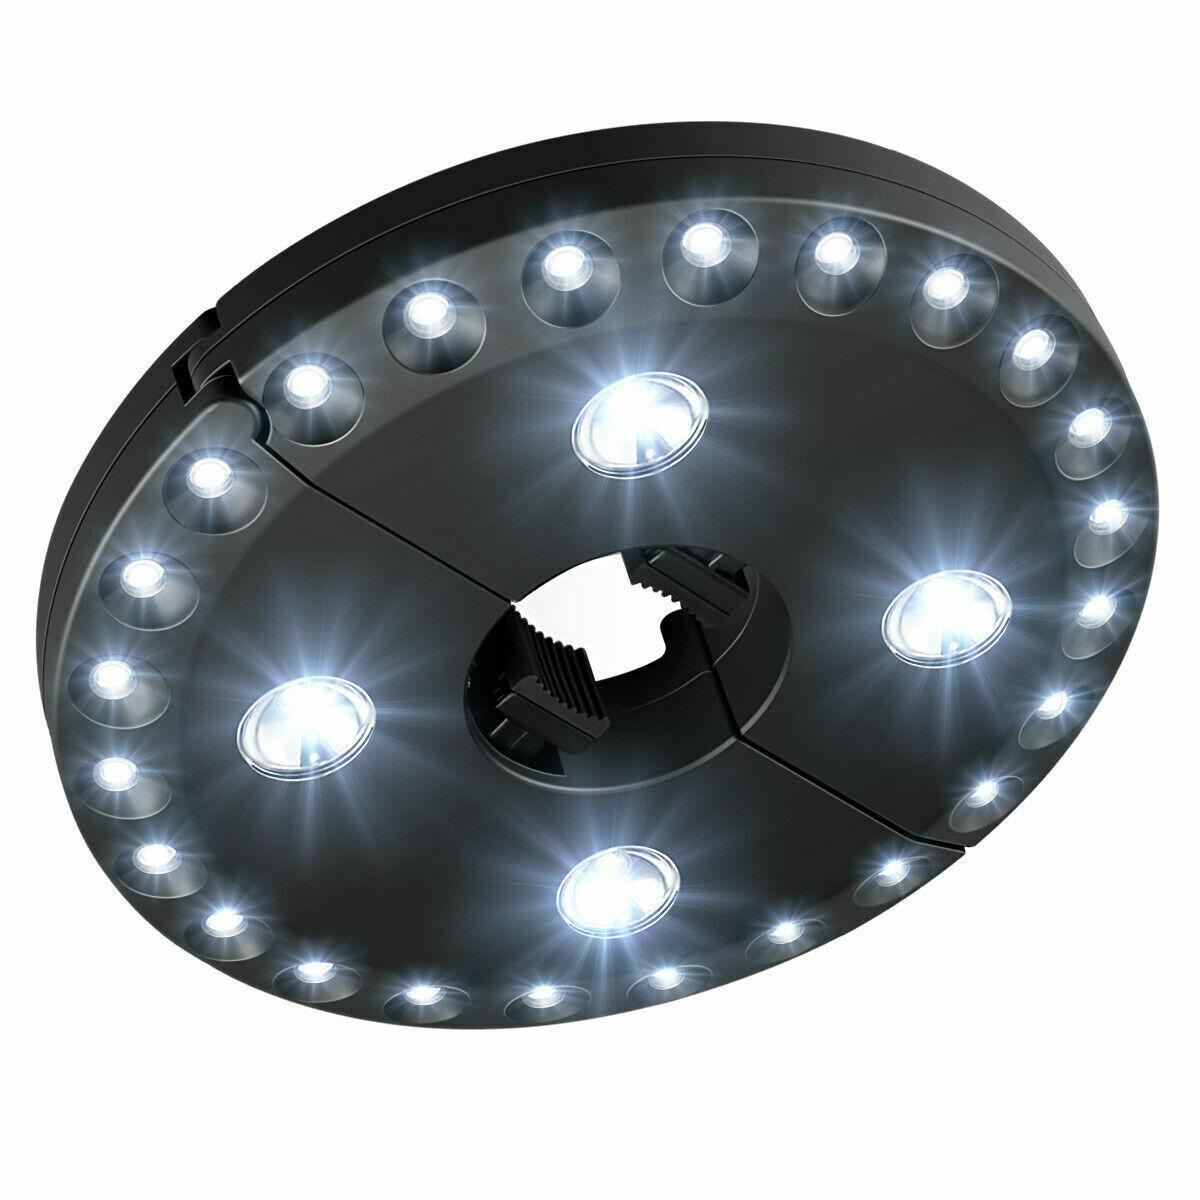 28 LED Patio Umbrella Parasol Lights 3 Brightness Mode Outdoor Camping Lamps New